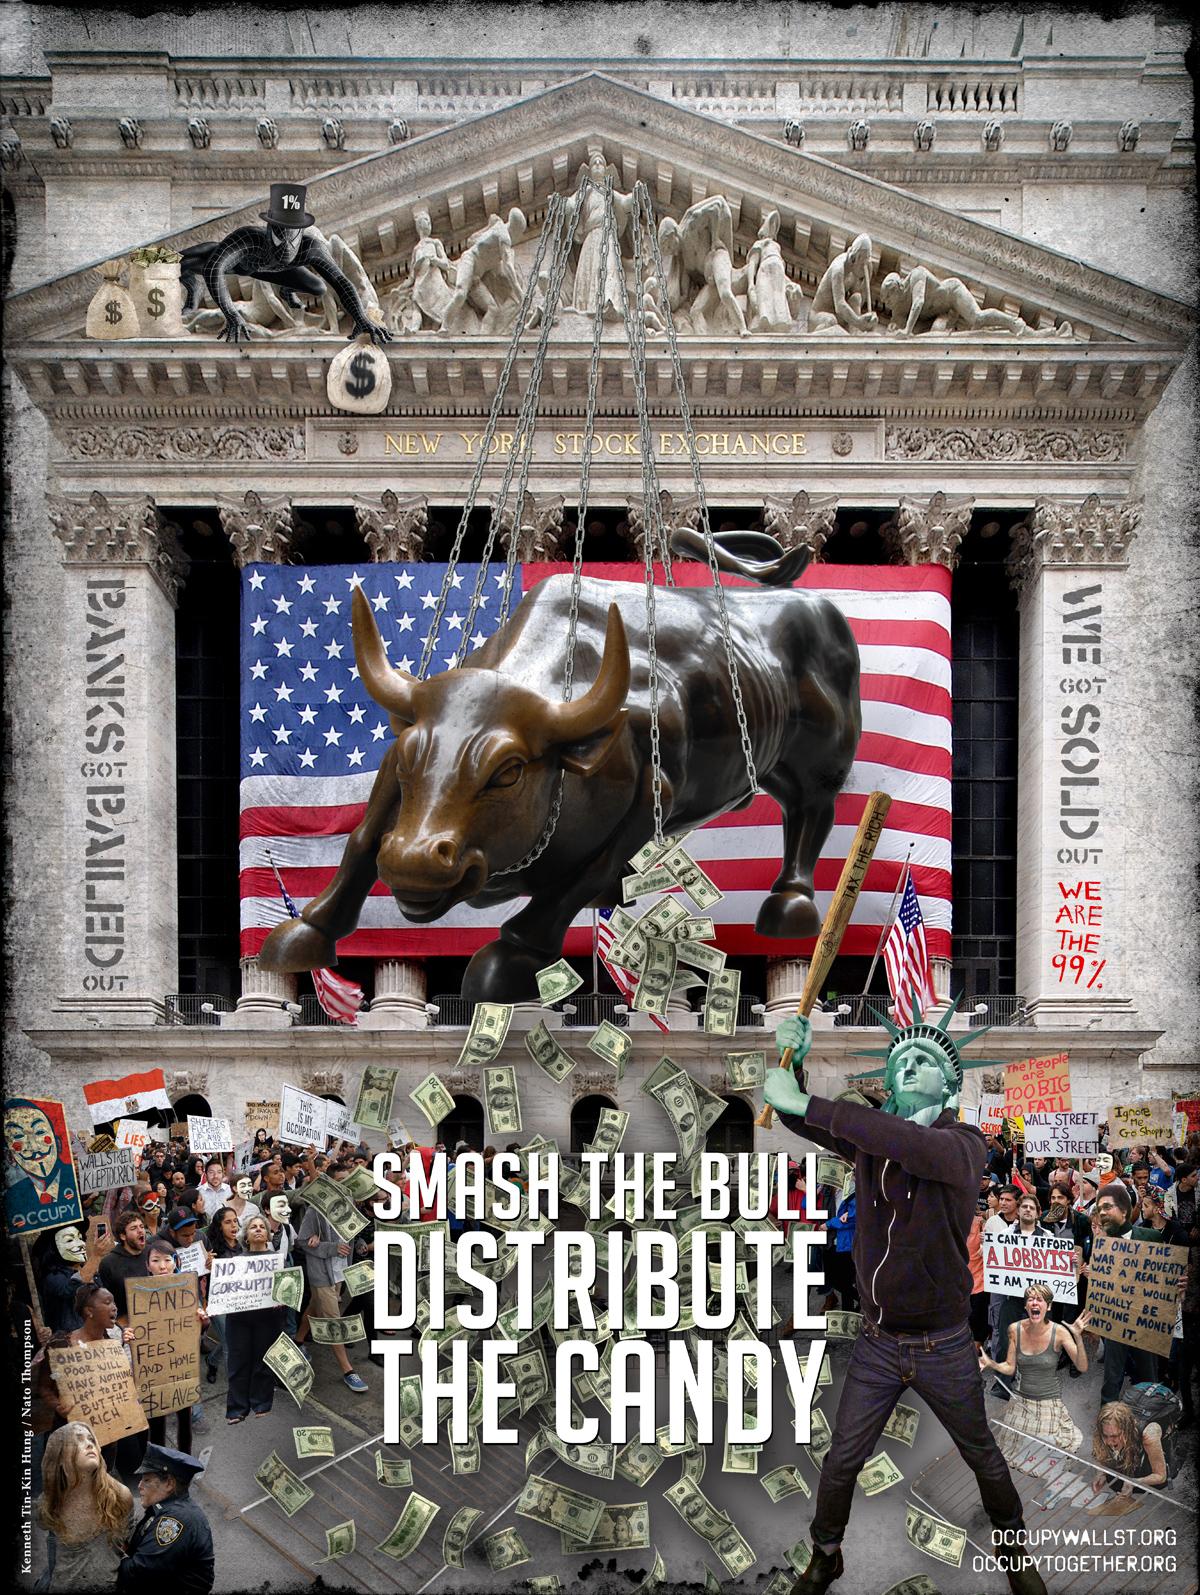 Occupy_Wall_Street